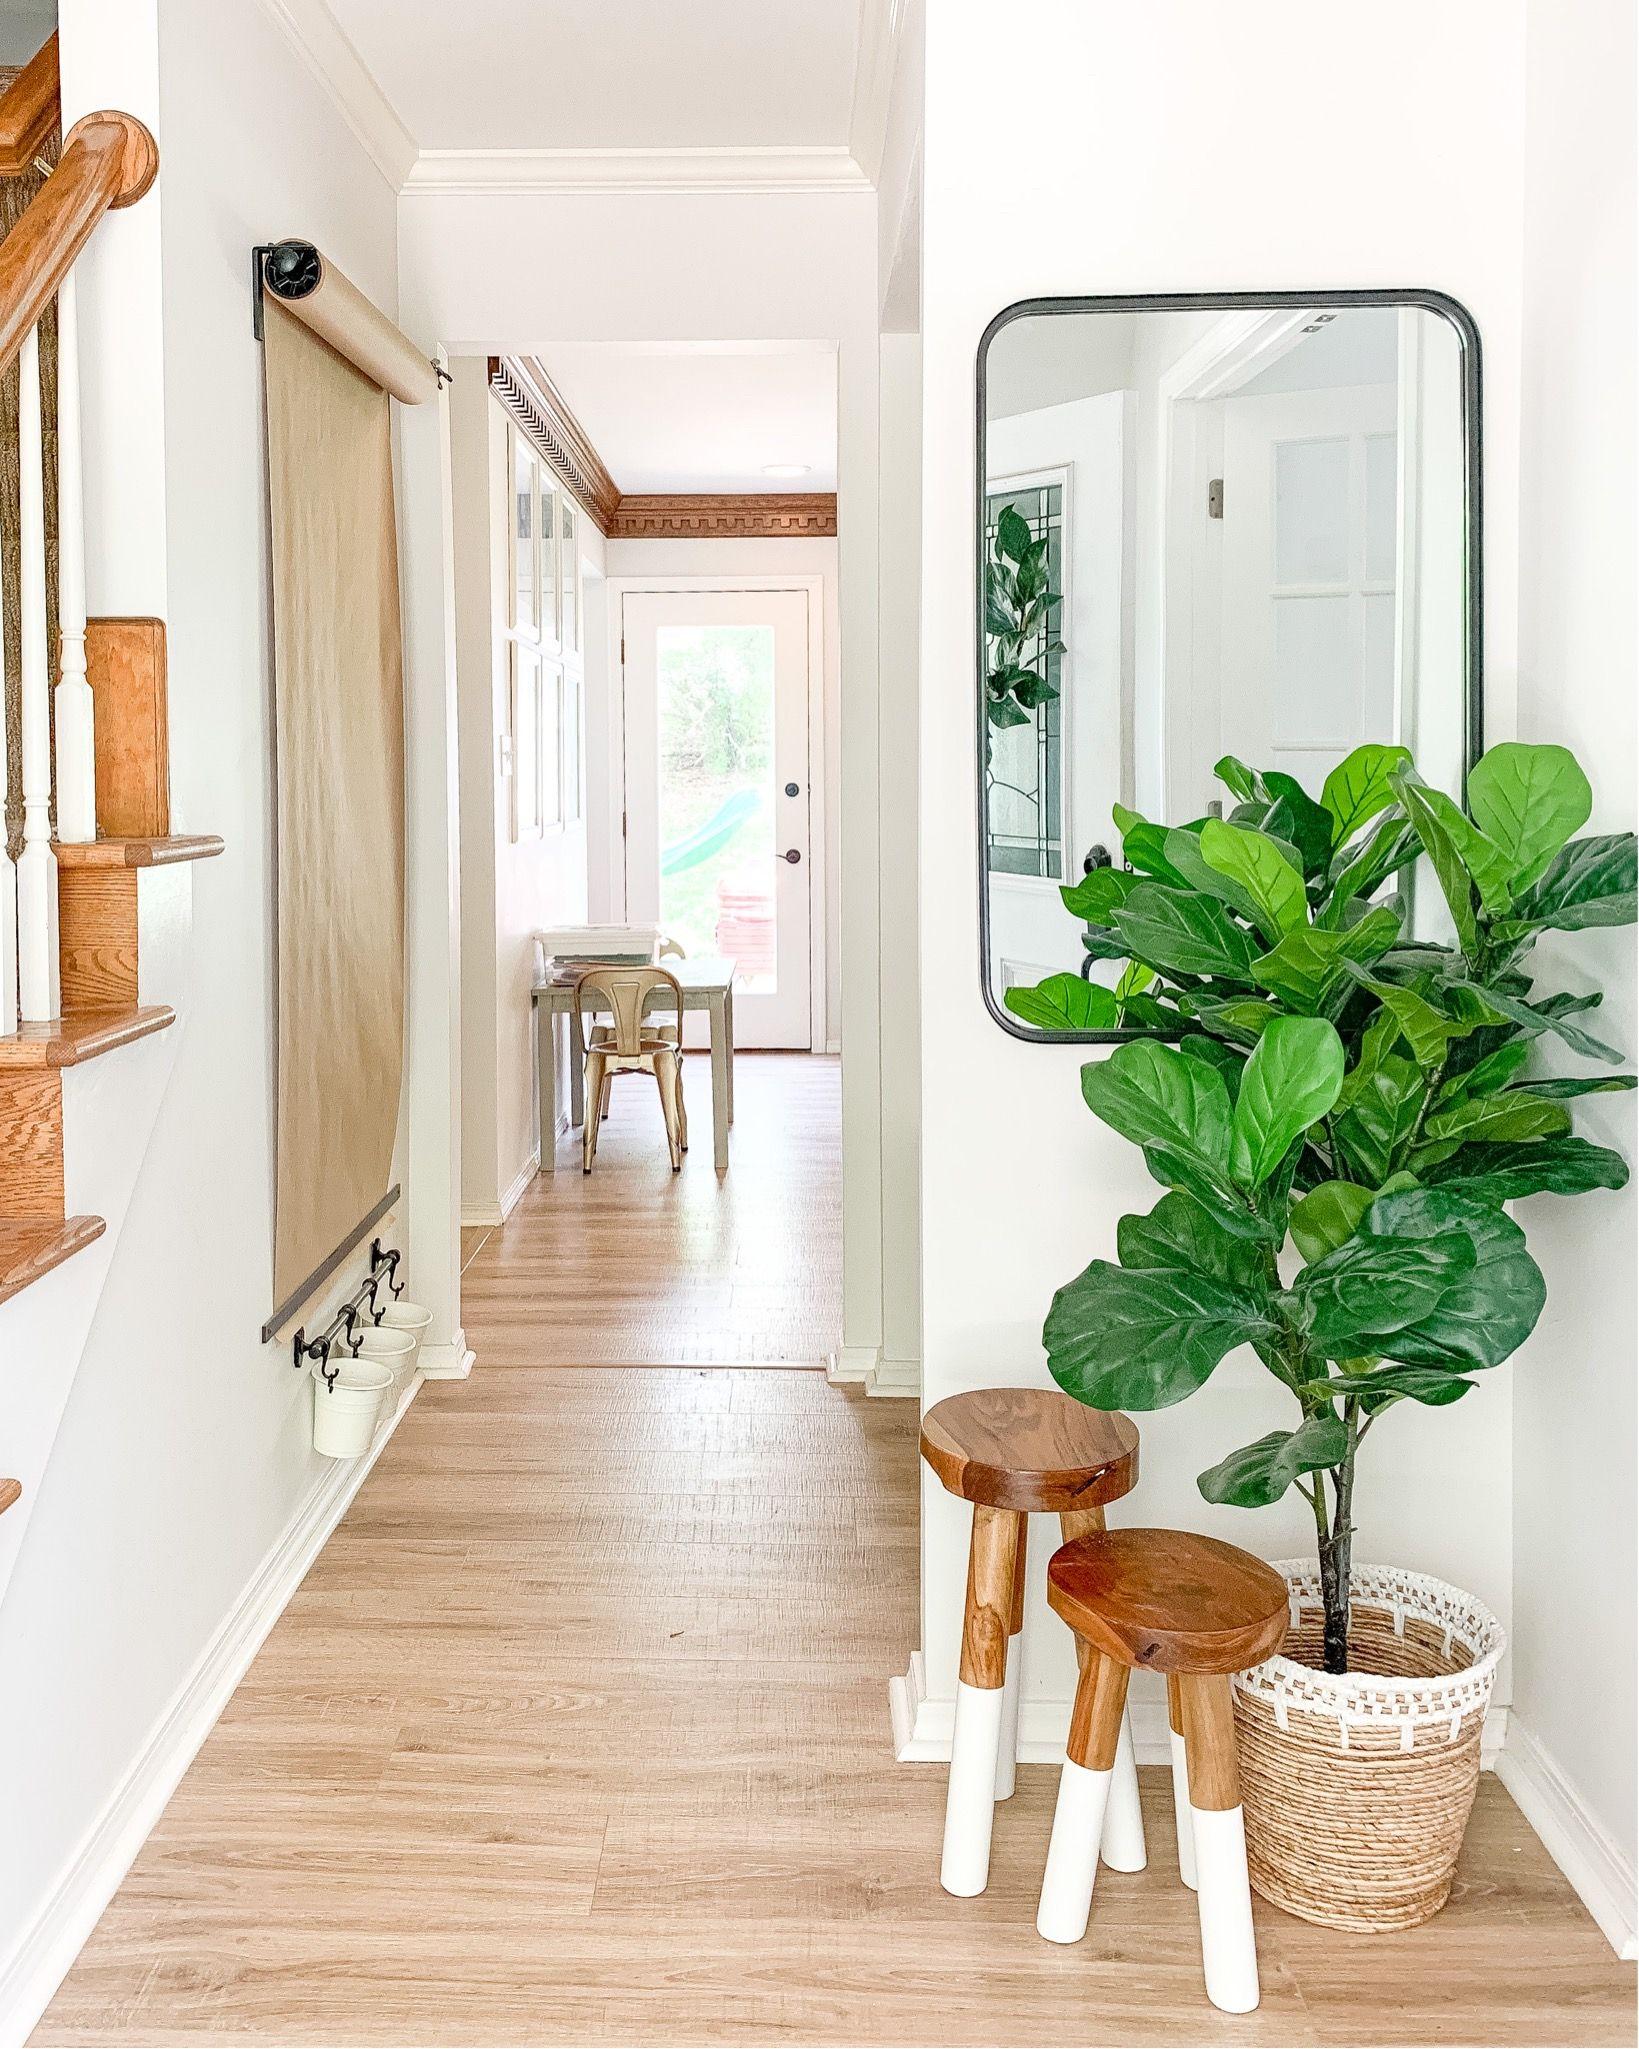 Mid Century Modern Home Decor From Amazon - check out this post full of amazon Home decor from amazon for your mid century modern home. #amazonhome #amazonfinds #amazondecor